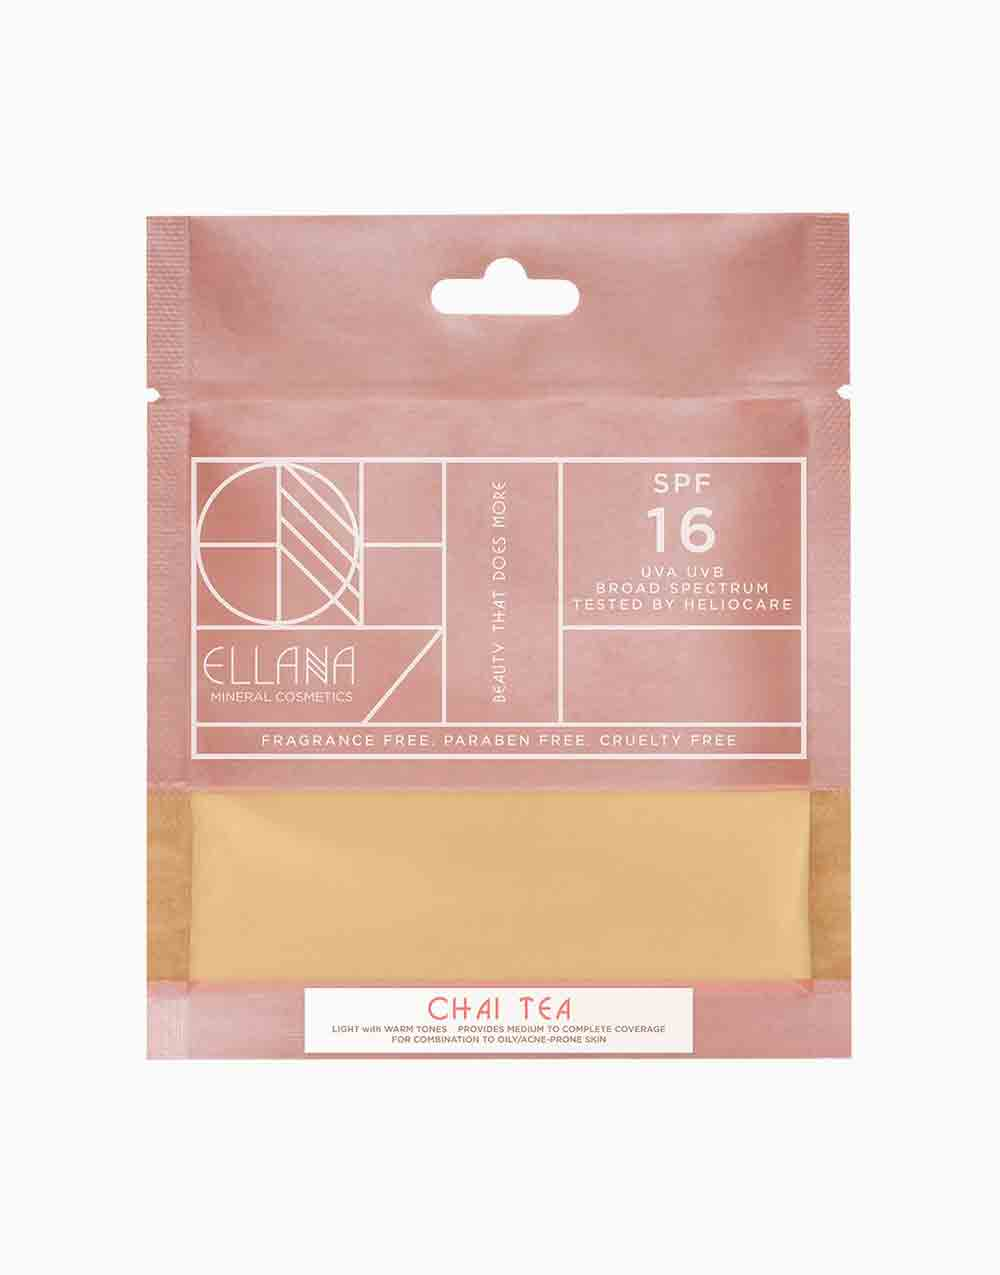 Loose Mineral Foundation Refill by Ellana Mineral Cosmetics | Chai Tea Latte